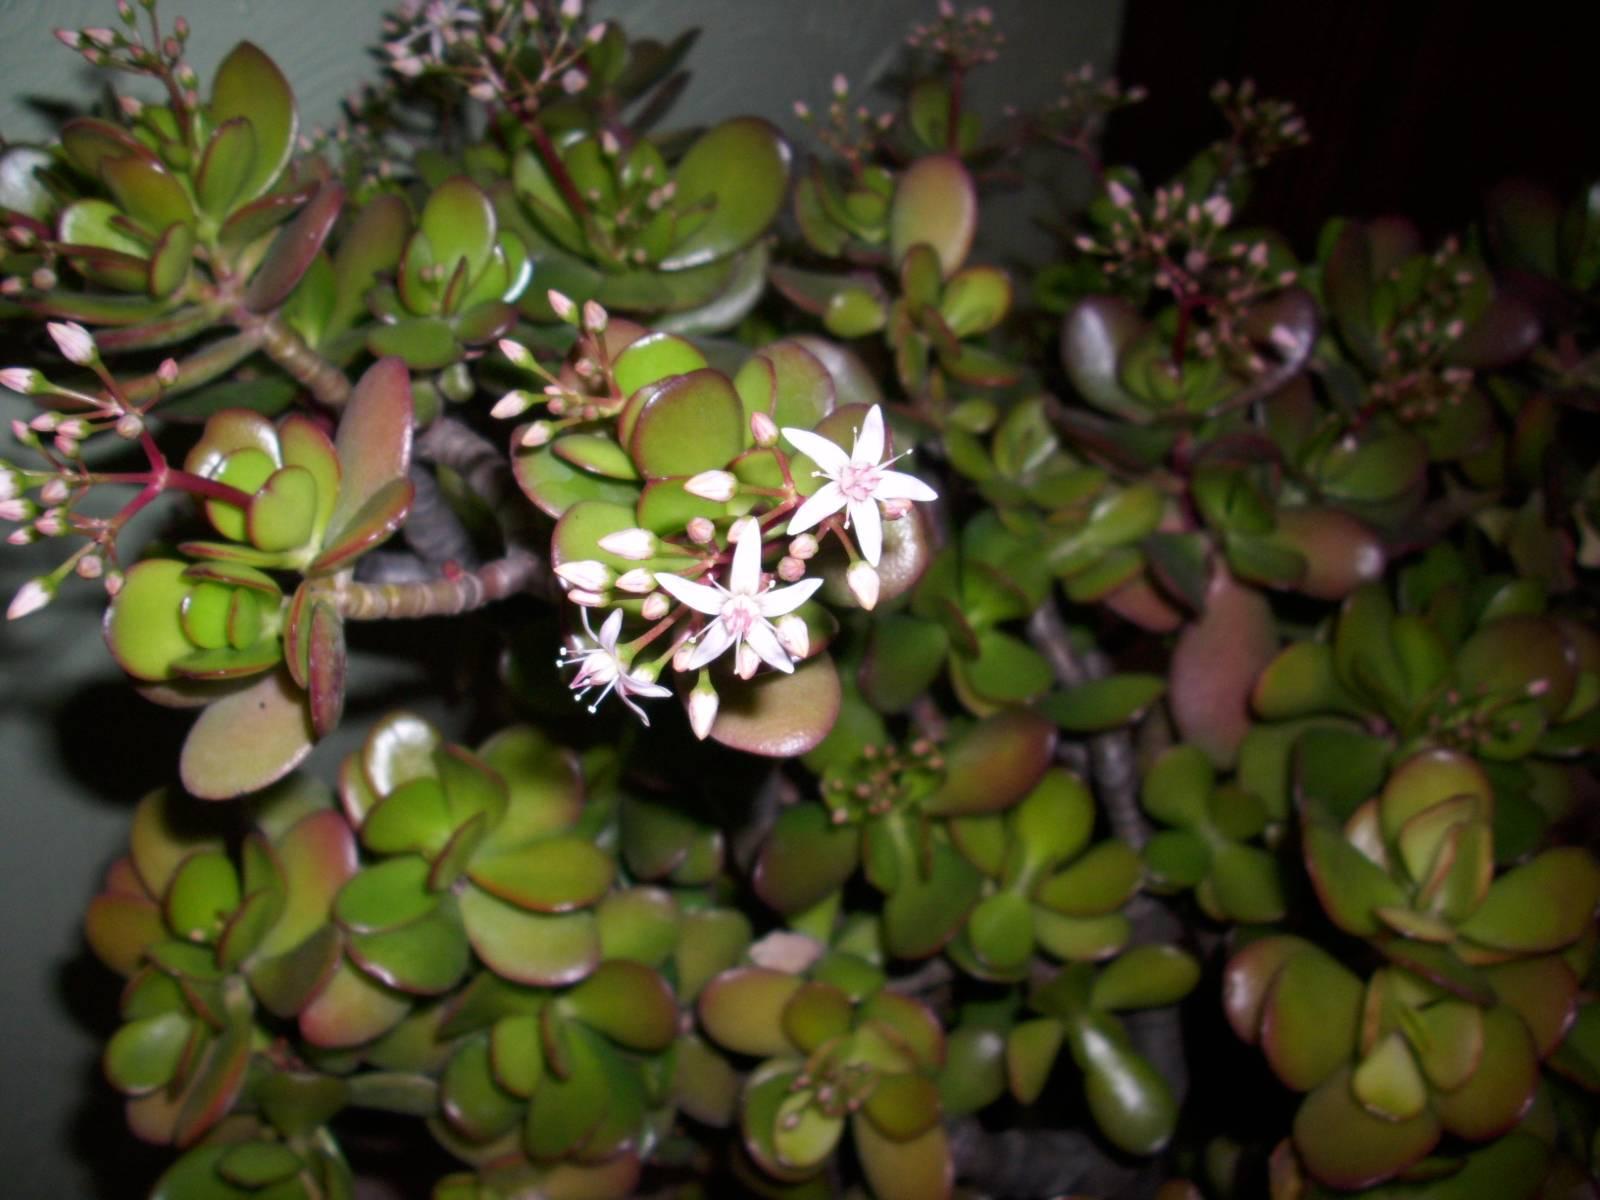 Arbre de jade crassula ovata mes plantes un petit coin de paradis - Entretien orchidee apres floraison ...